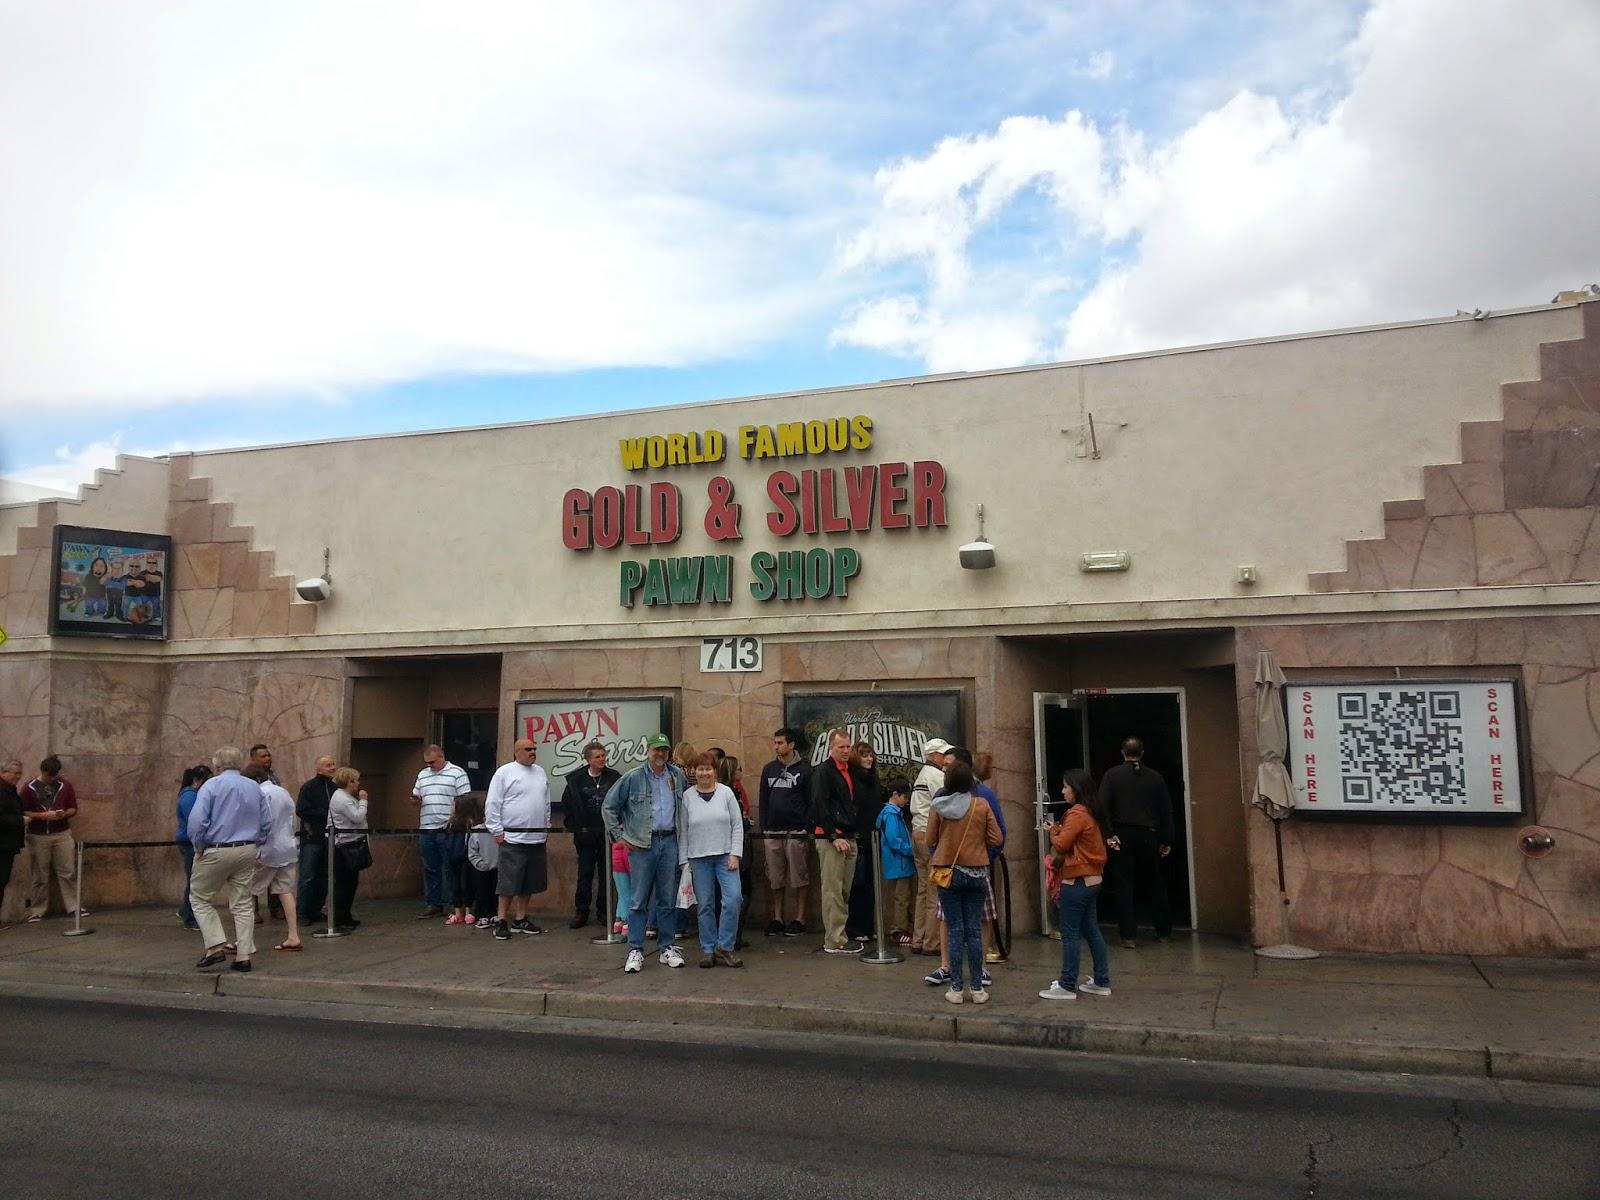 Pawn stars location in Vegas